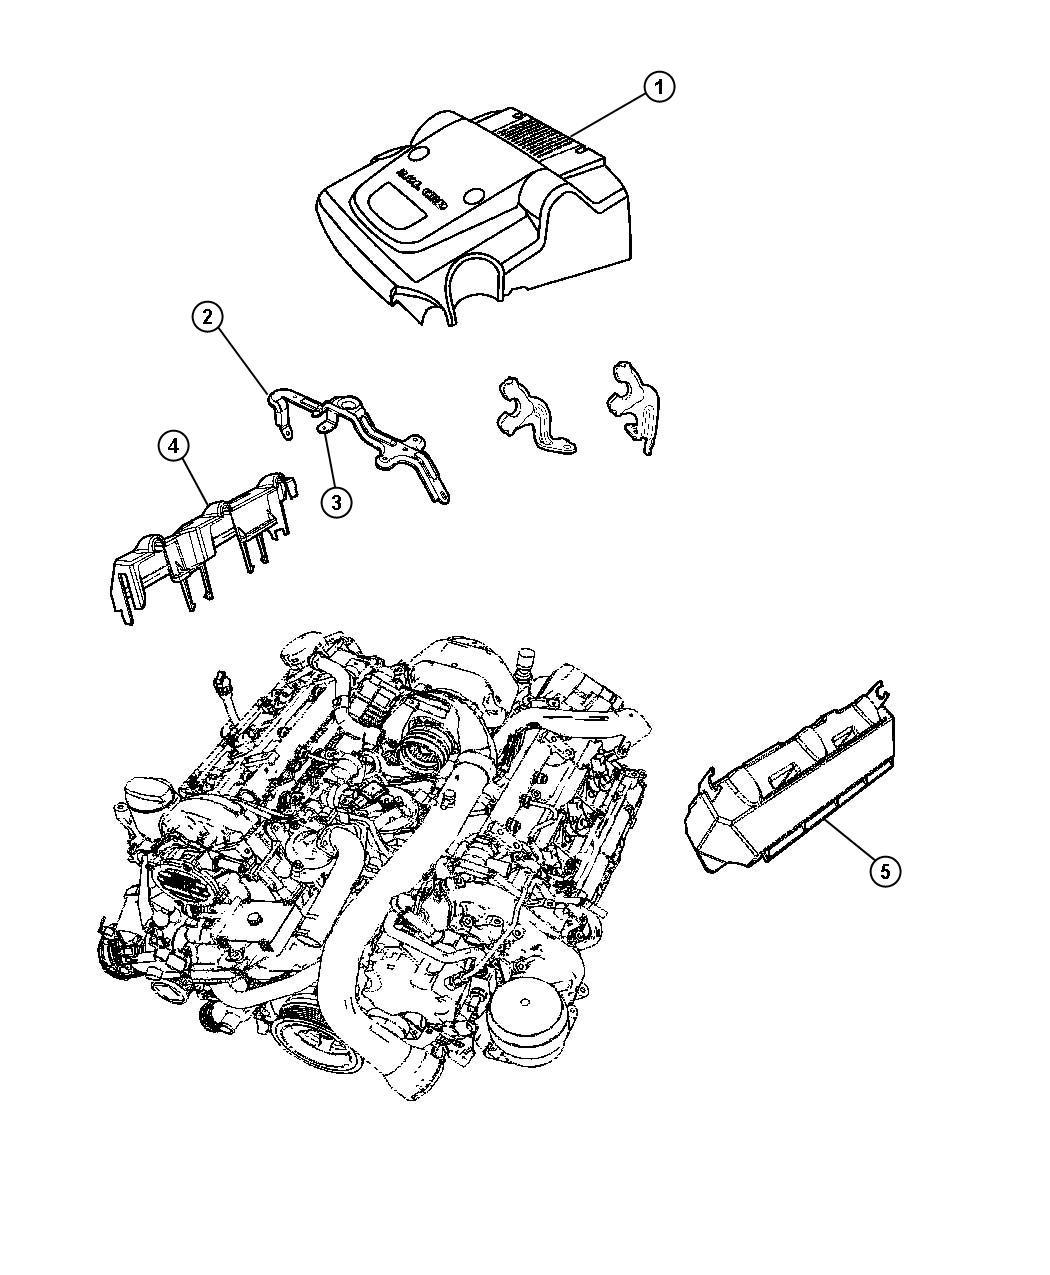 Diagram Jeep Grand Cherokee Laredo Engine Diagram